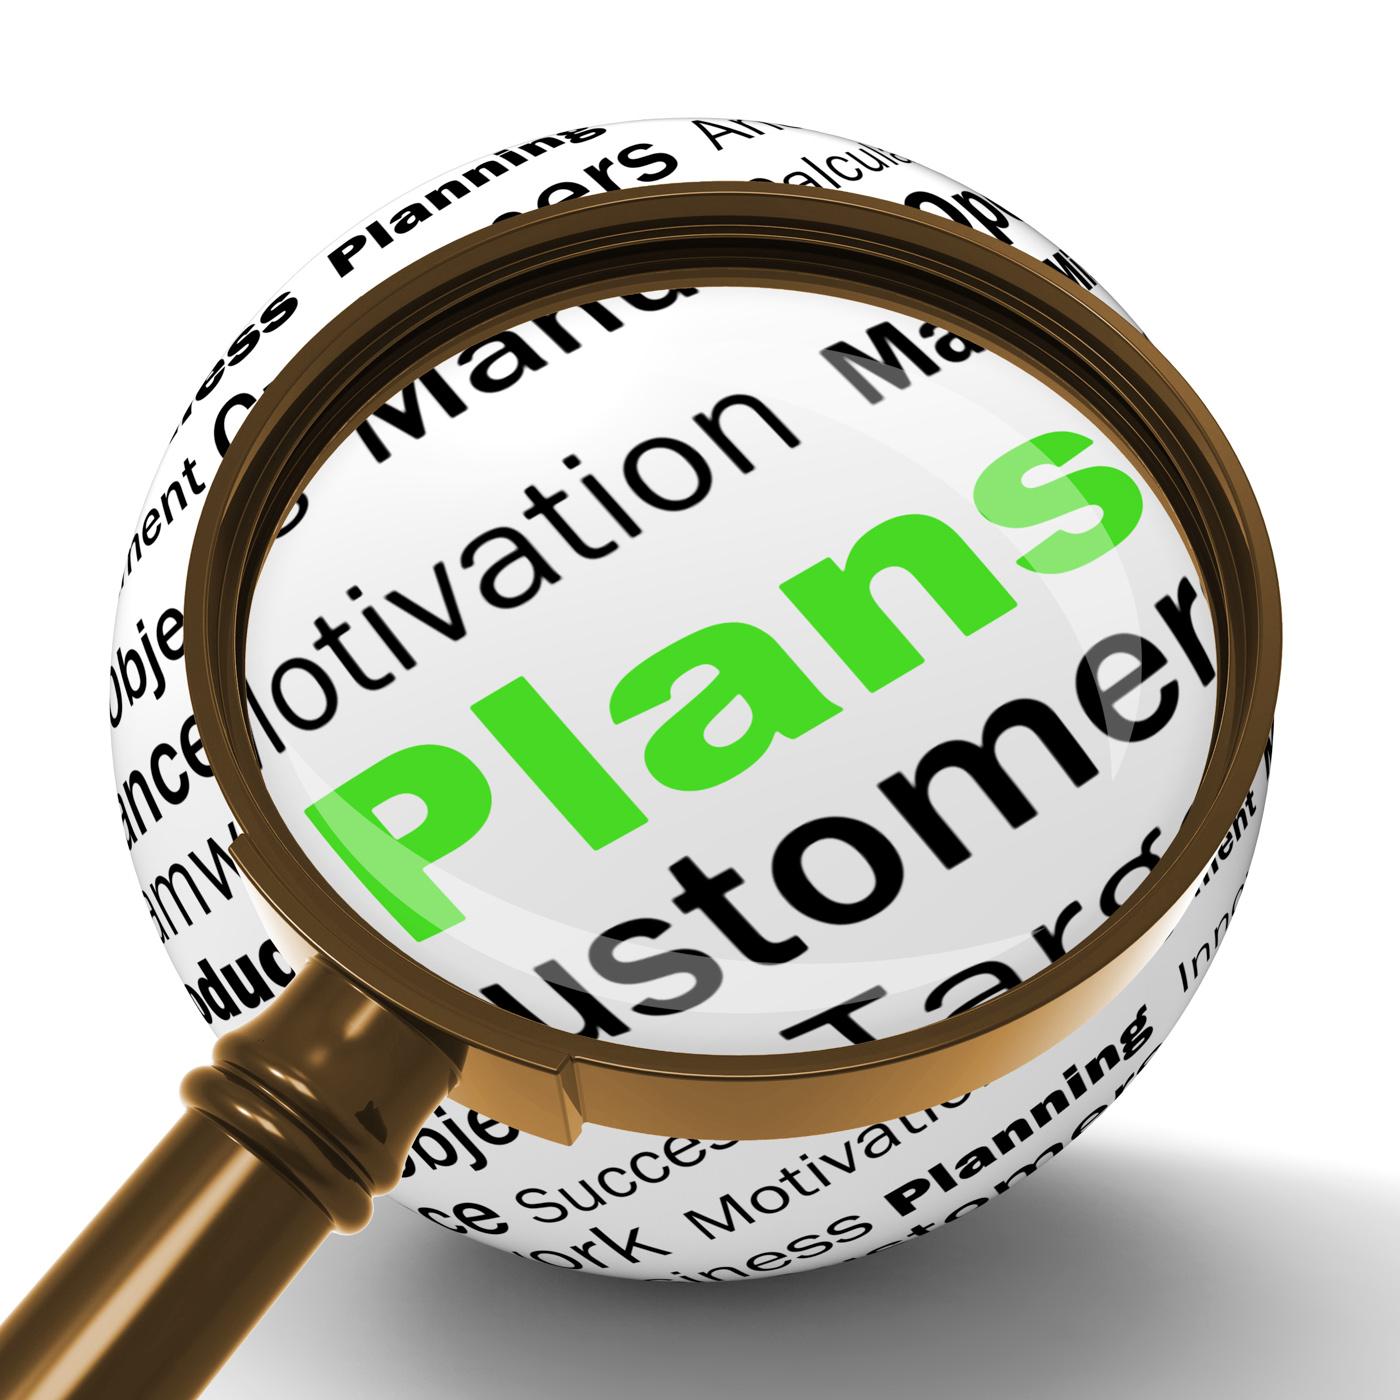 Plans Magnifier Definition Shows Customers Target Arrangement Or Aim, Aim, Aims, Aspirations, Aspire, HQ Photo